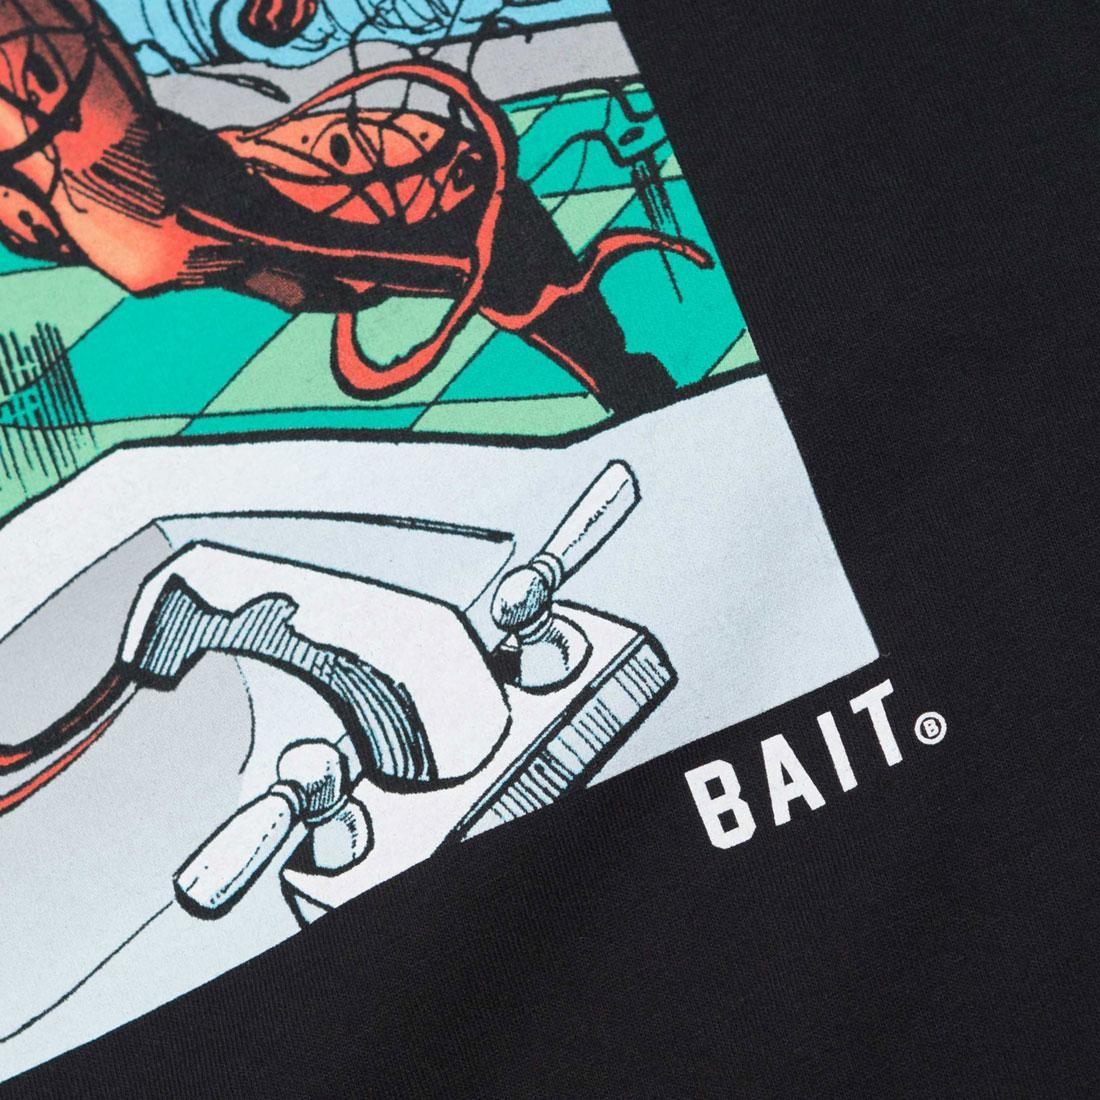 【SALE】BAIT CARNAGE LOGO TEE  - 197-MRV-TEE-001